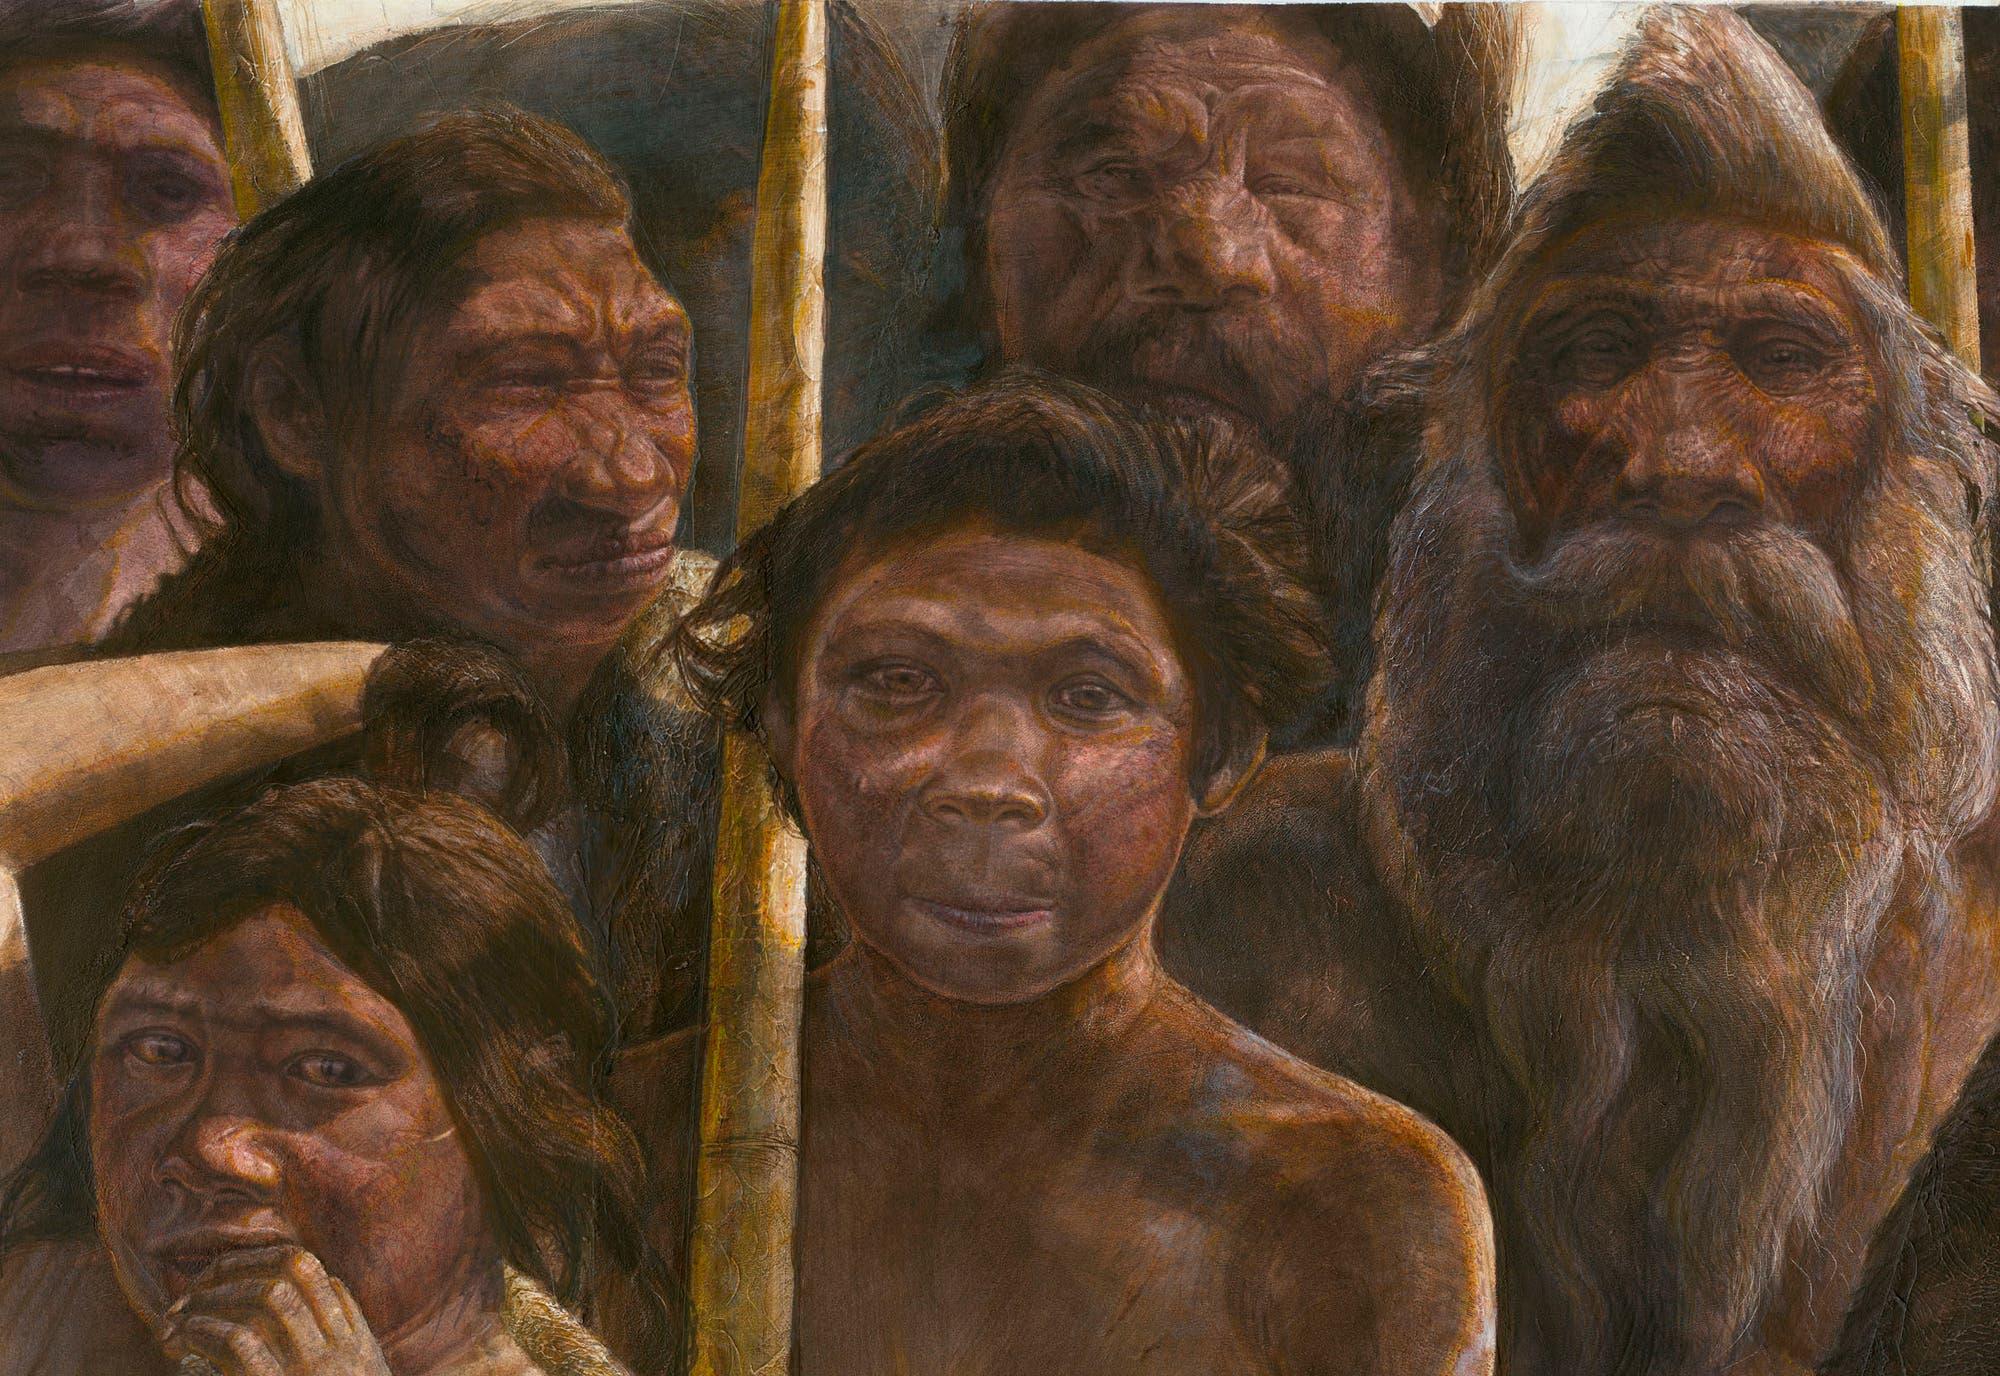 Die Gruppe aus der Sima de los Huesos